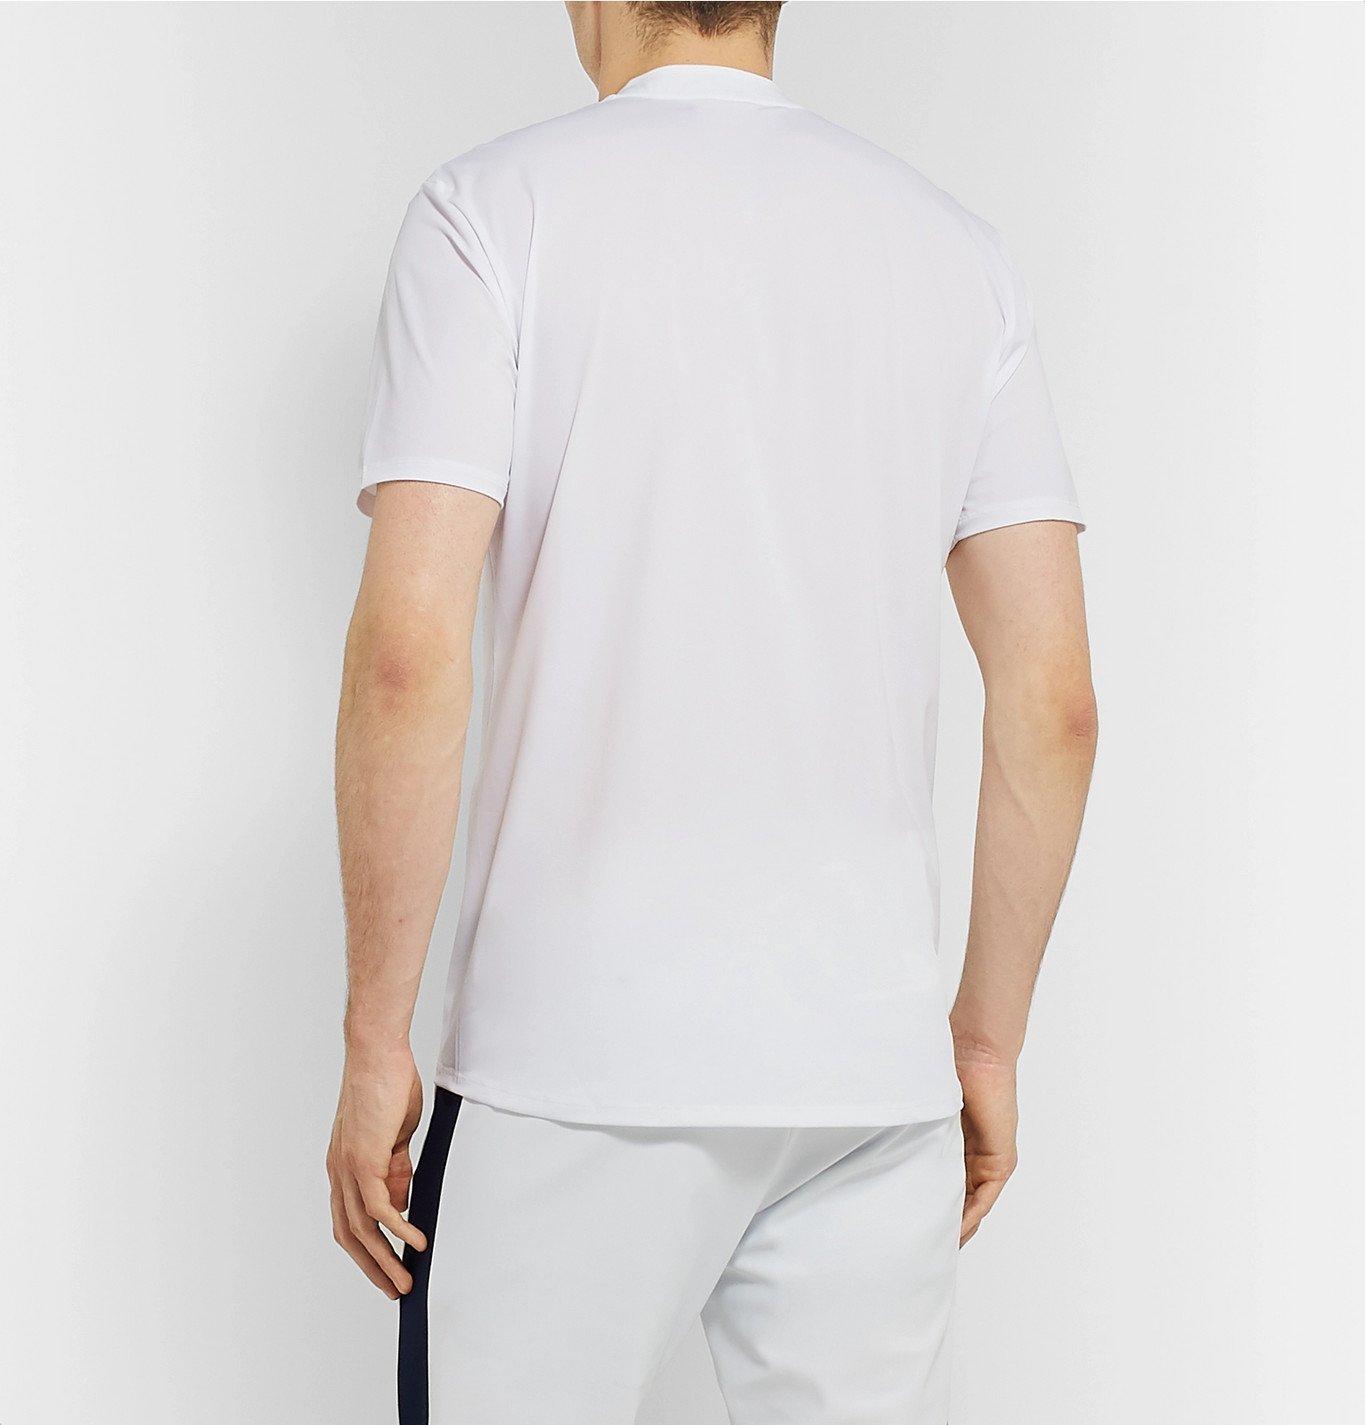 Castore Andy Murray Arnaud Stretch Tech Jersey Tennis T Shirt White Castore